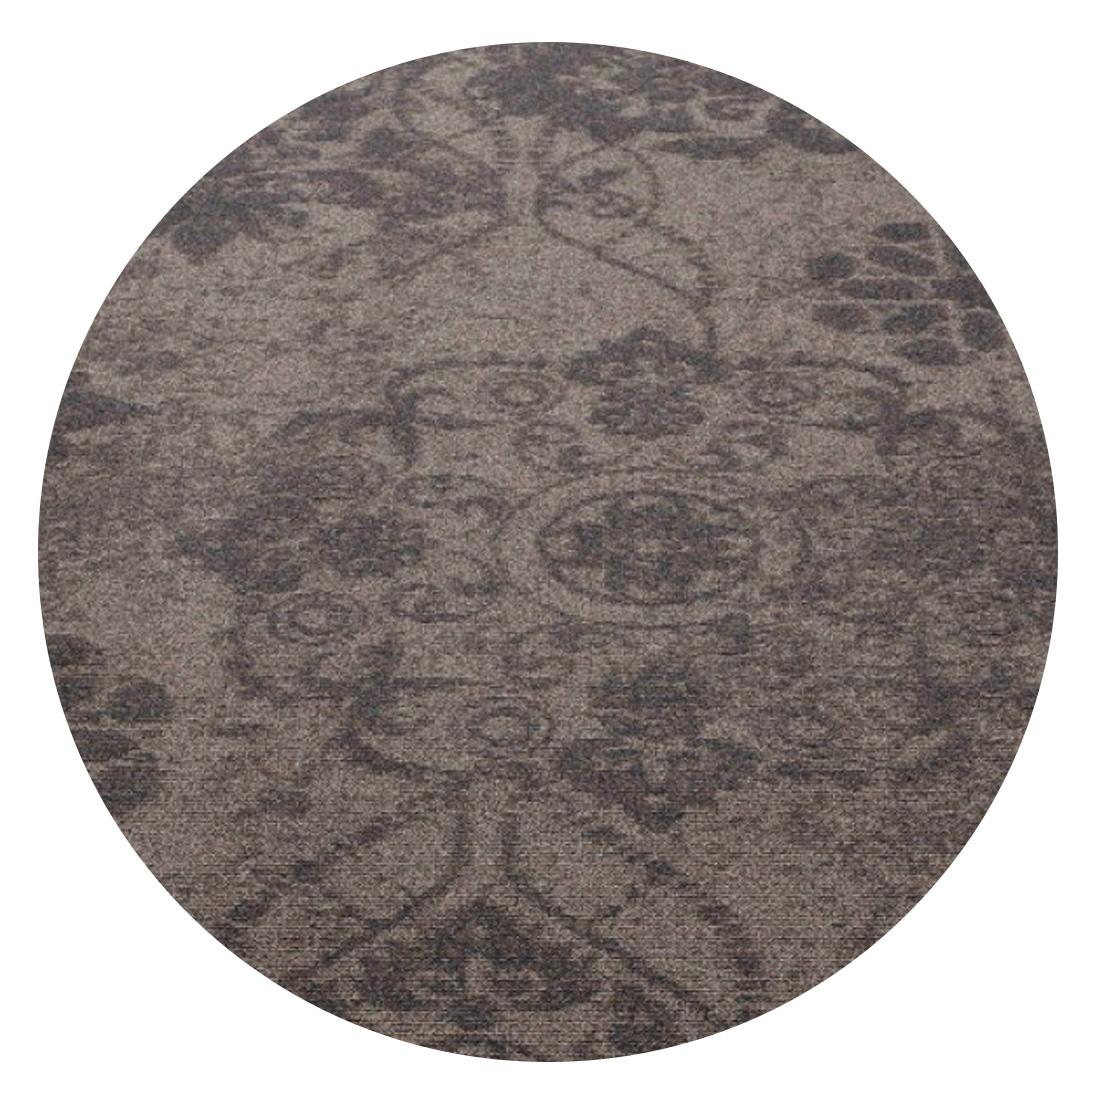 Rond Vintage Vloerkleed Desso Patterns AA17-9513